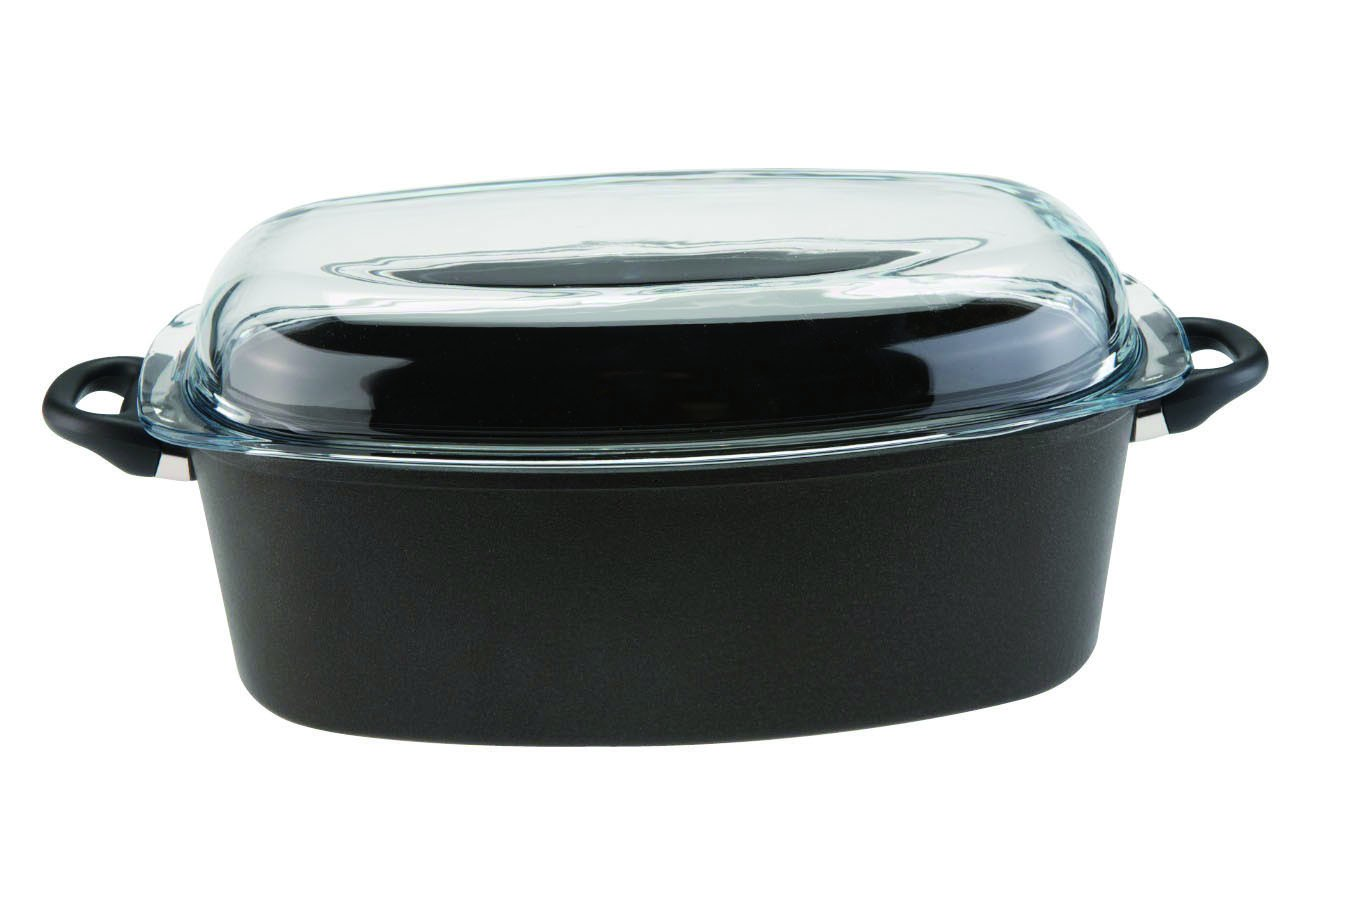 SKK 255 Titanium 2000 Plus - Fuente con tapa de cristal (8 L): Amazon.es: Hogar